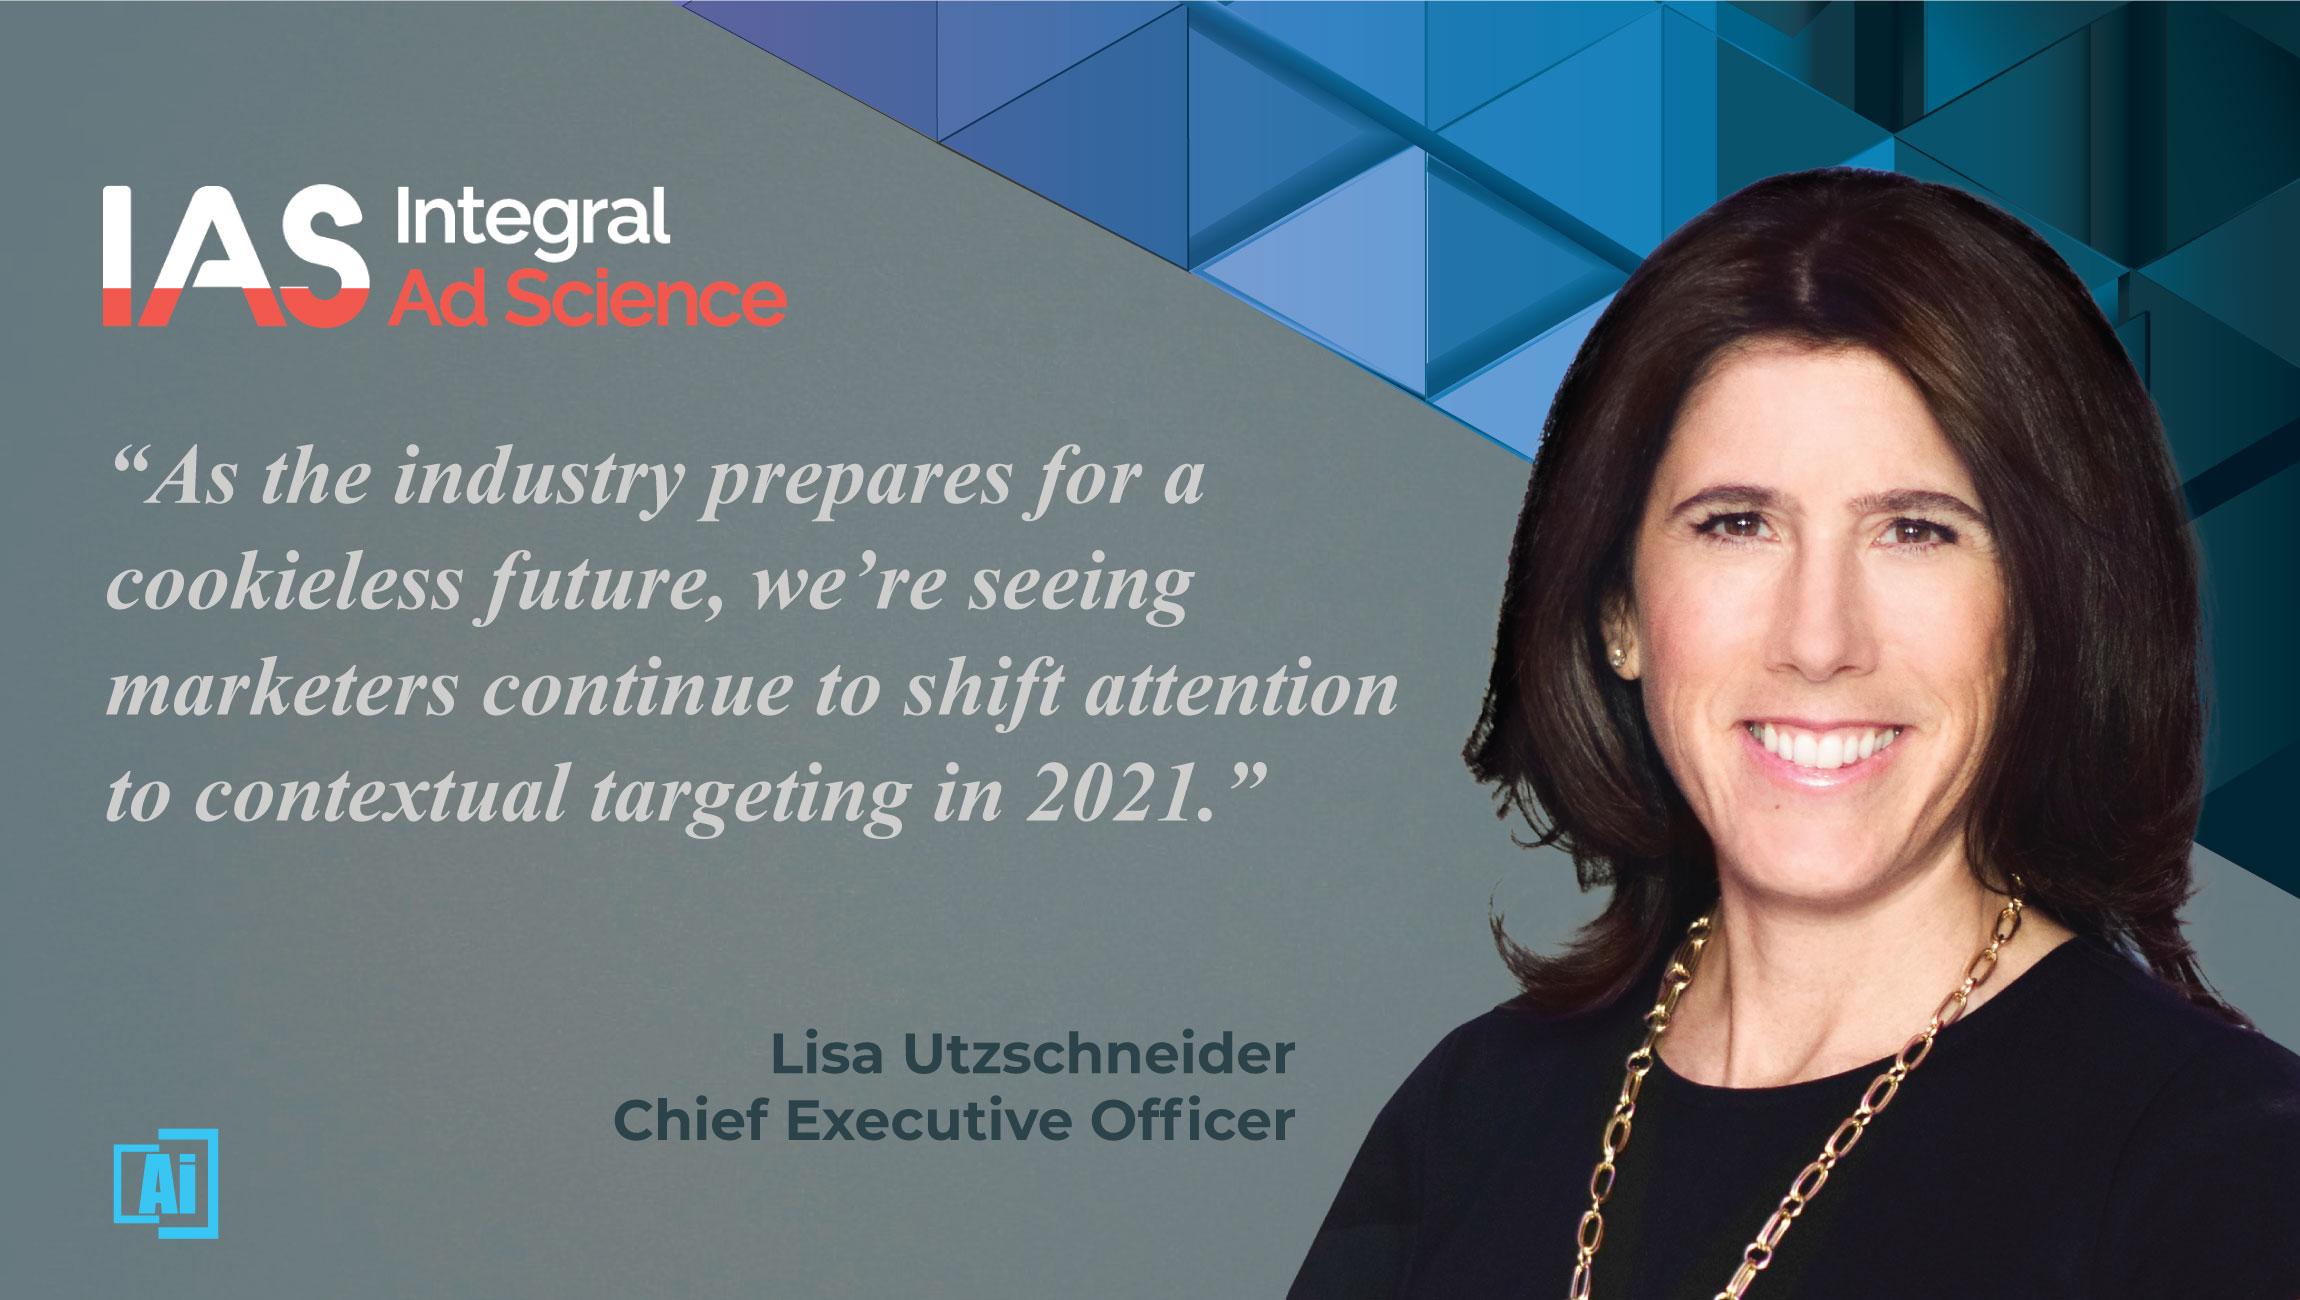 AiThority Interview with Lisa Utzschneider, CEO at IAS